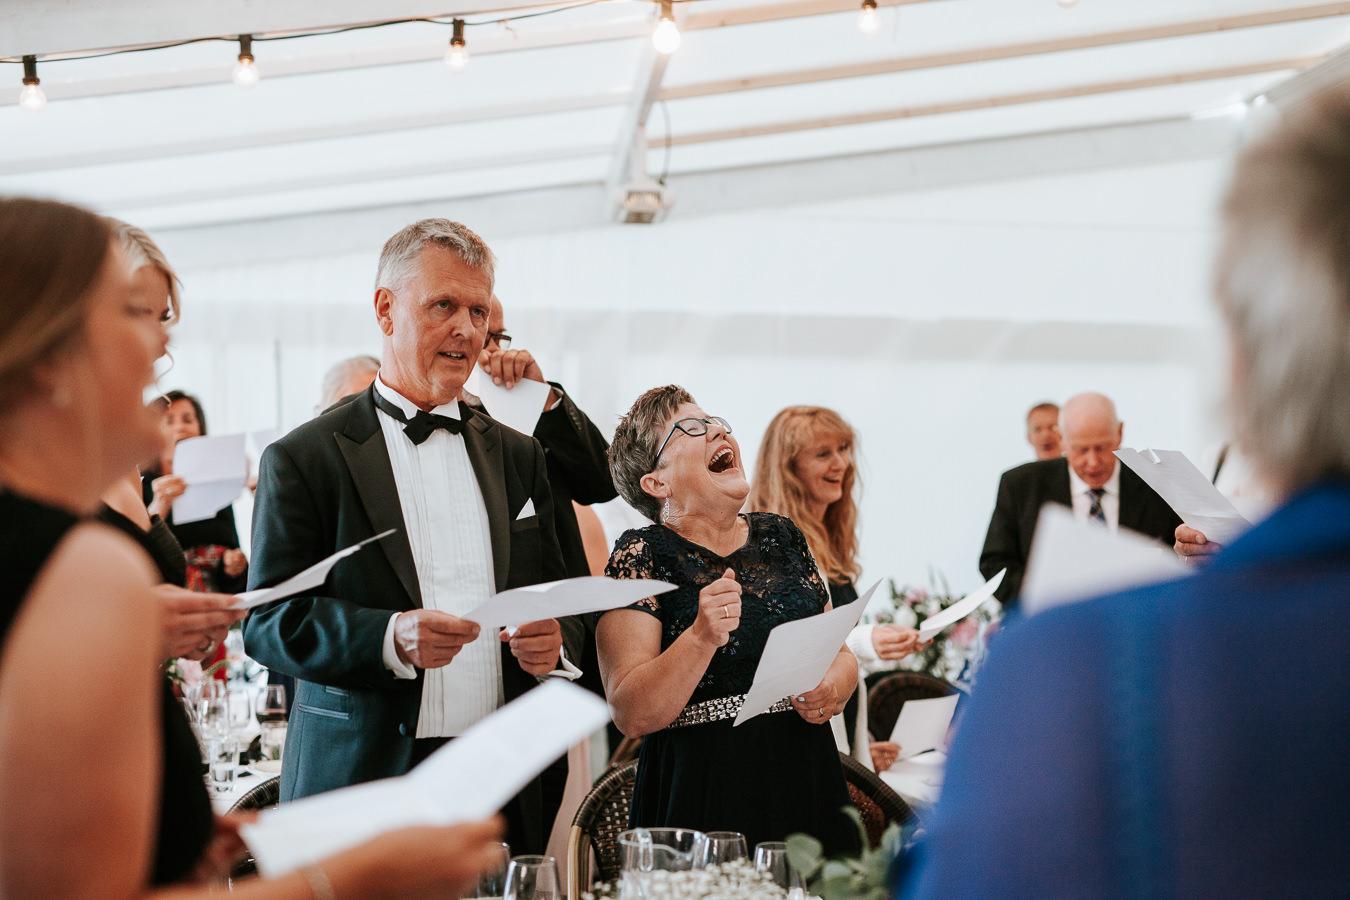 Bryllup-Hellviktangen-fotograf-tvedt-165.jpg